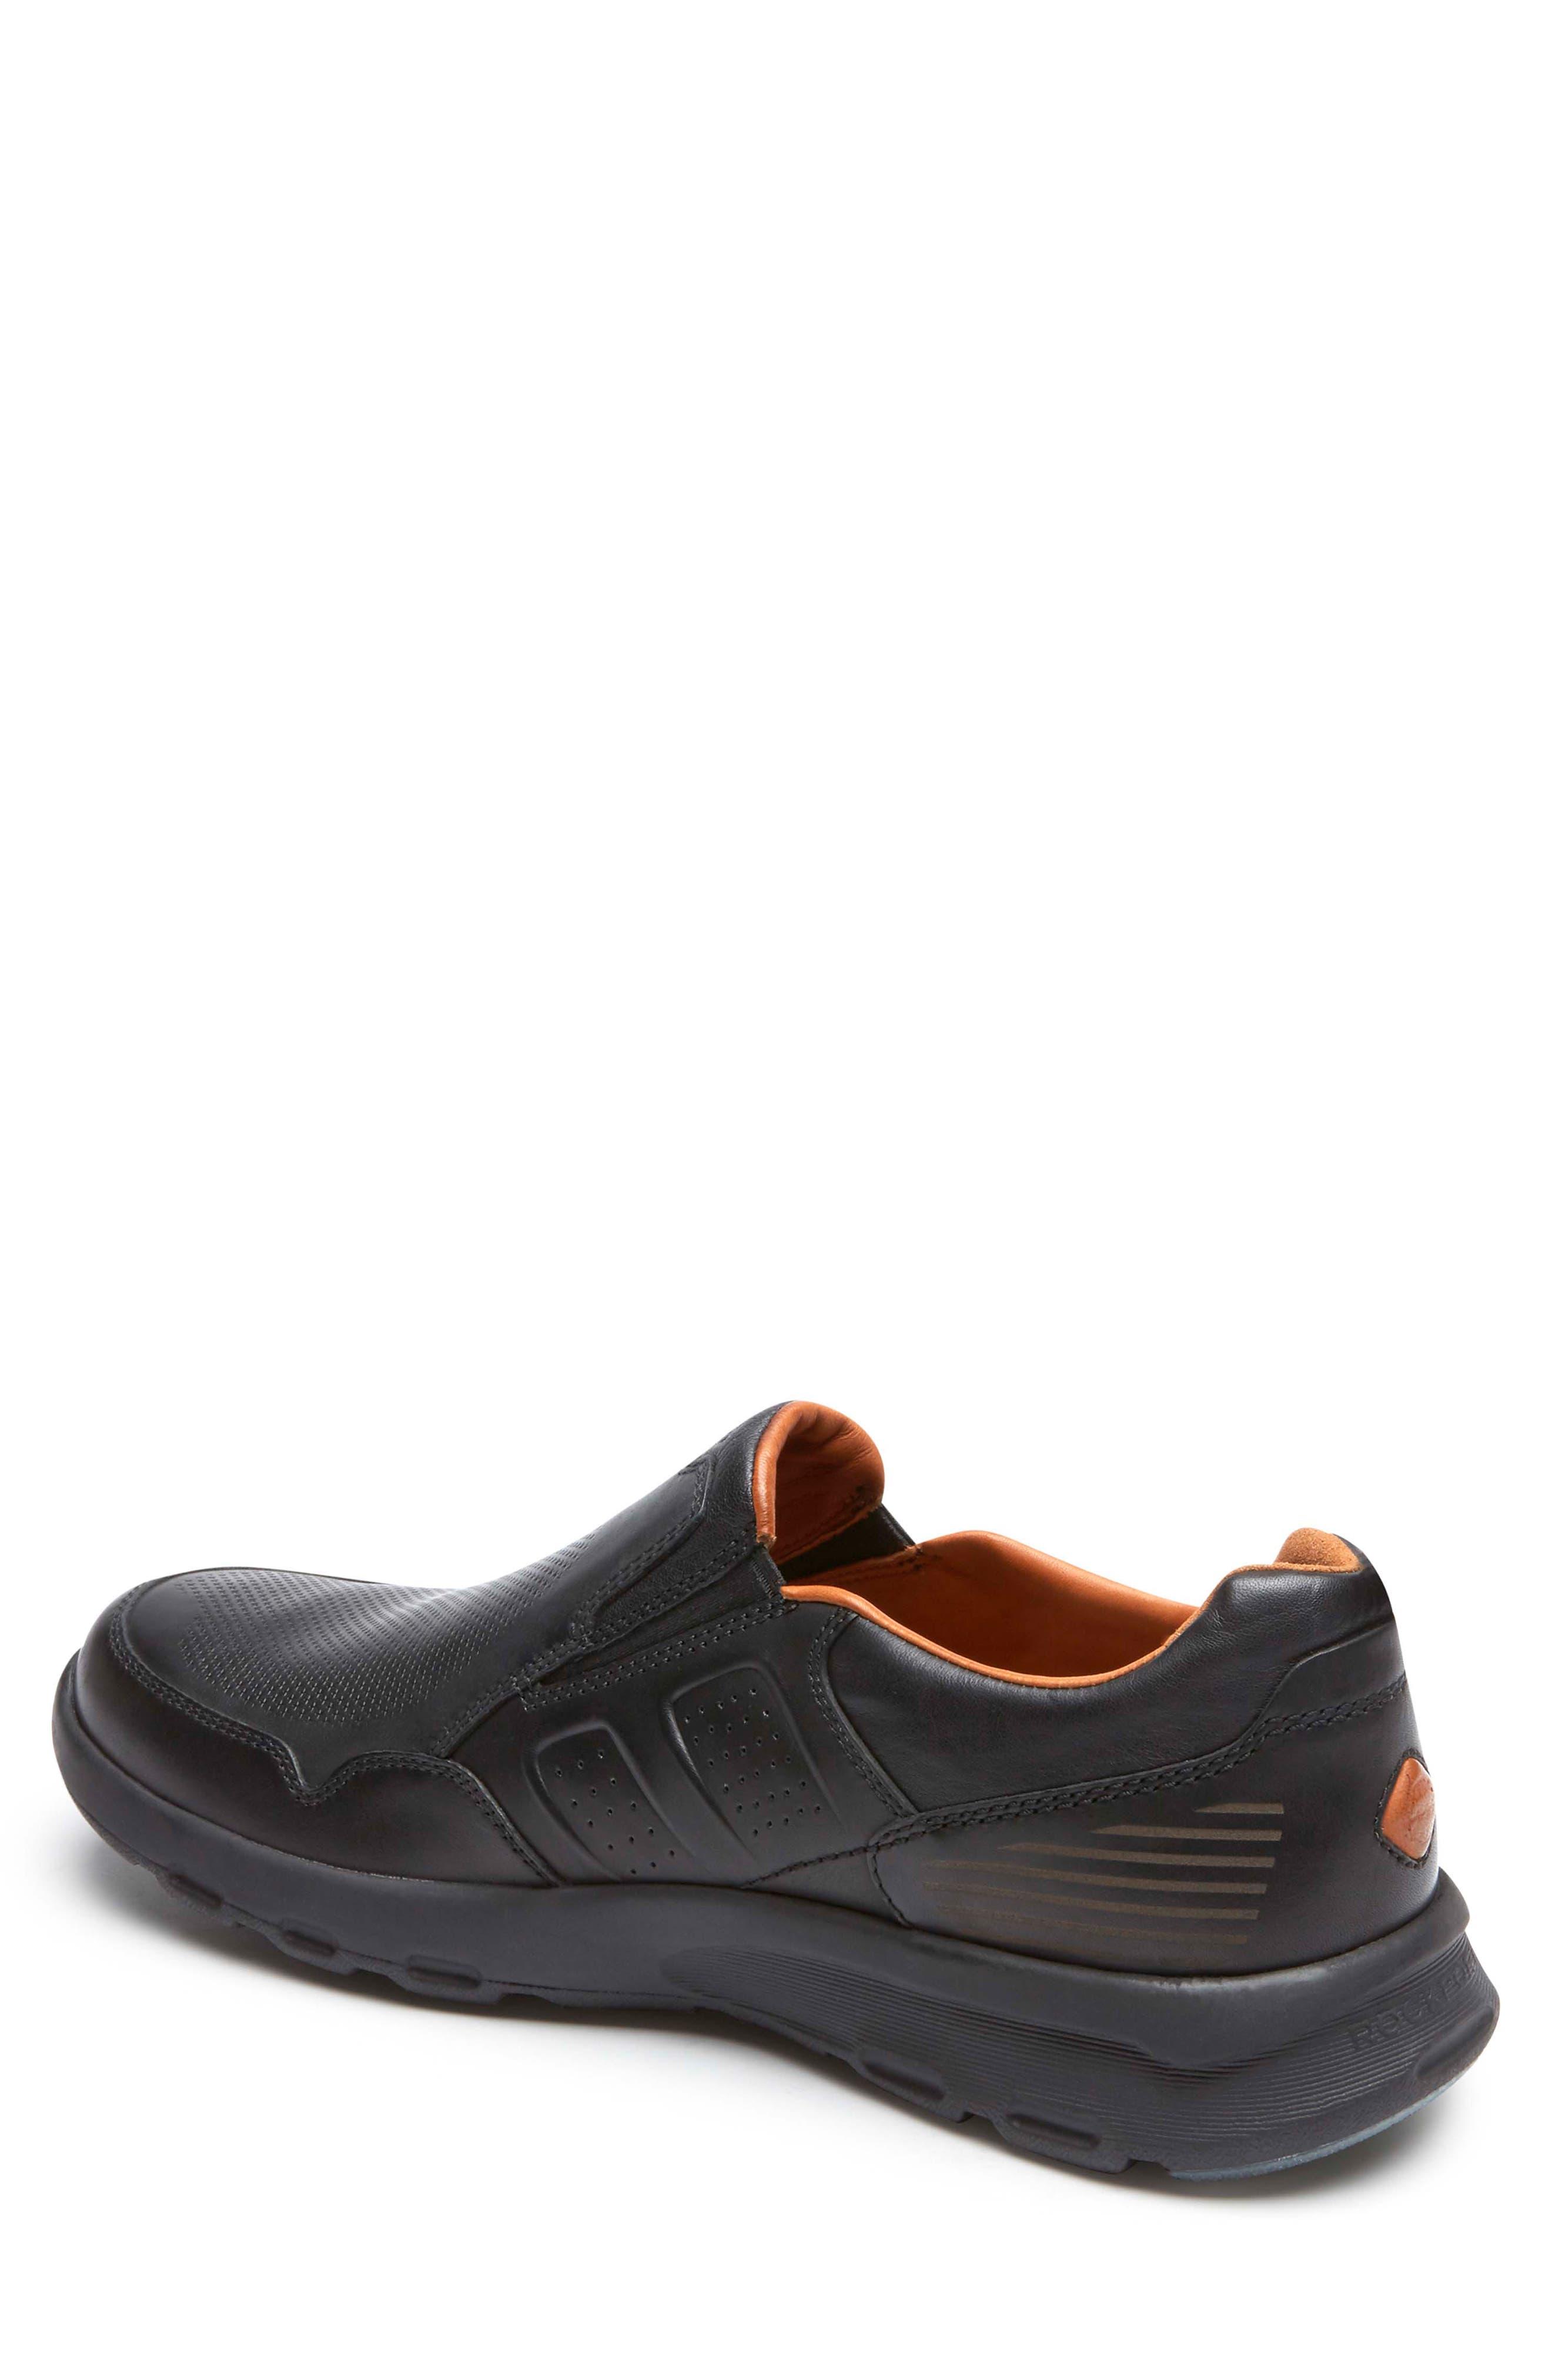 Let's Walk<sup>®</sup> Venetian Loafer,                             Alternate thumbnail 2, color,                             BLACK LEATHER